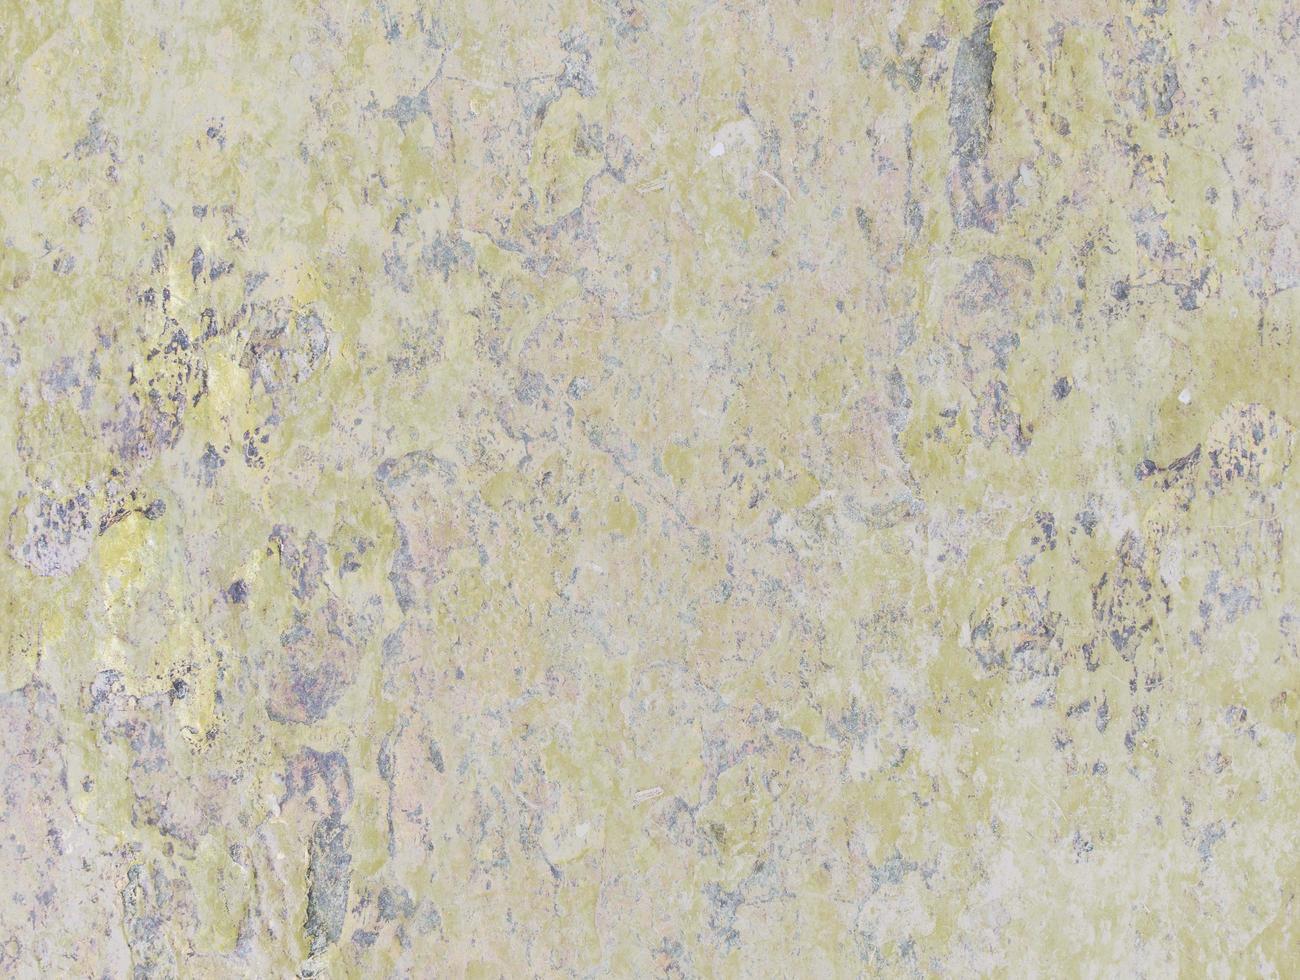 sfondo texture pietra astratta foto